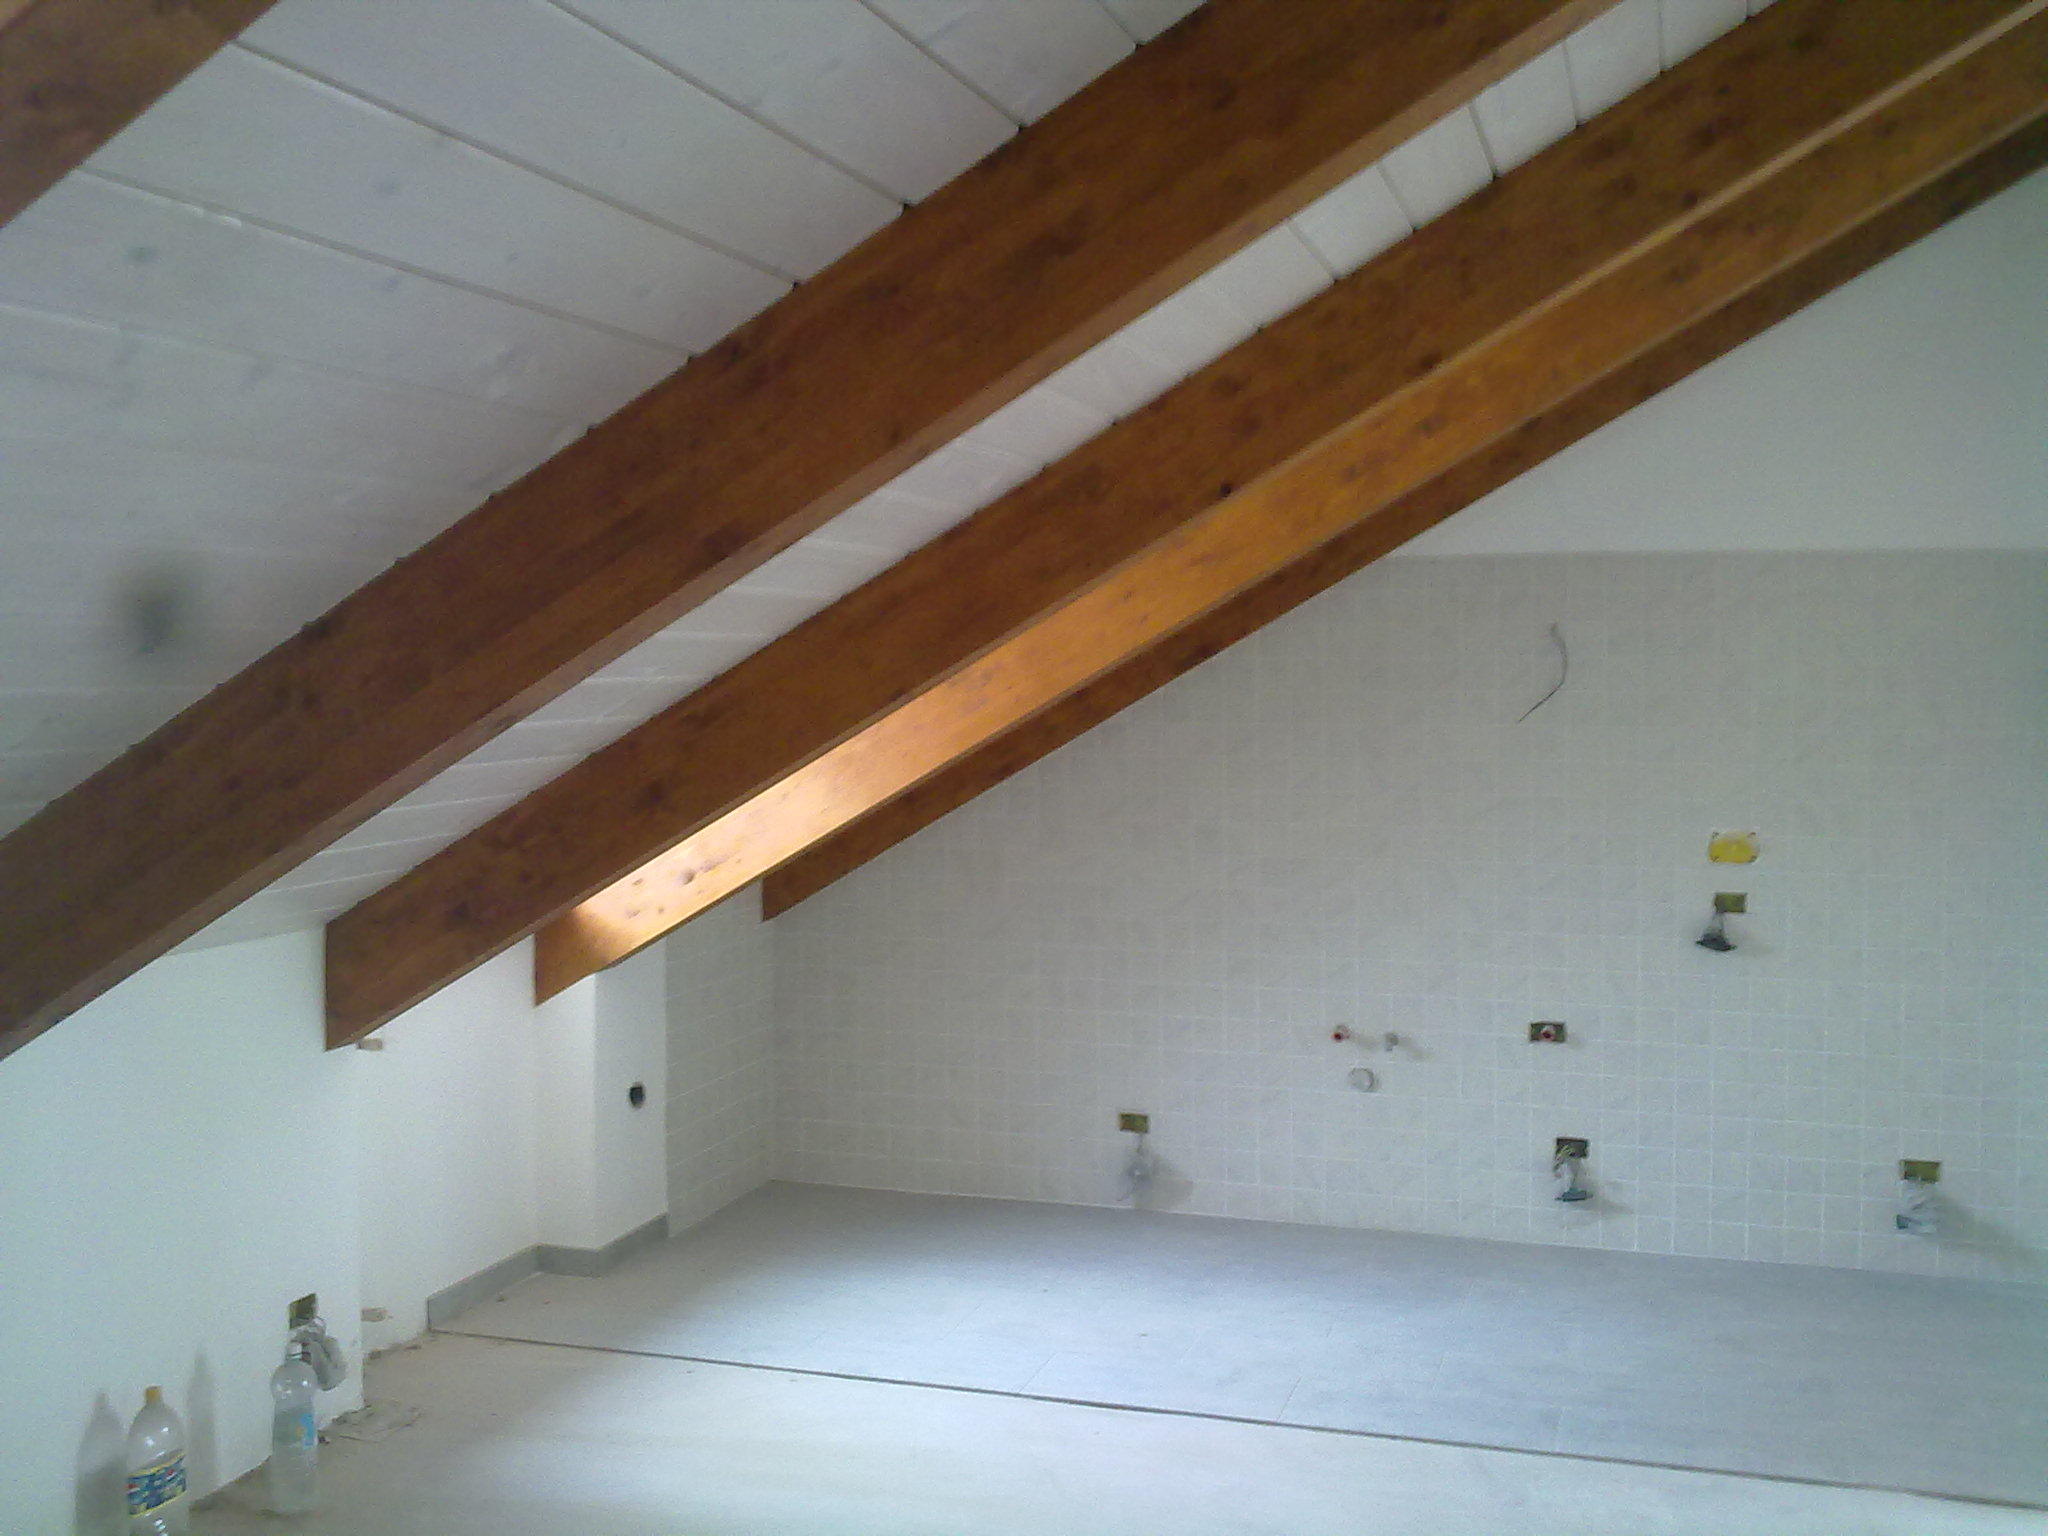 Prodaja loft open space torino torino italija corso for Loft open space torino